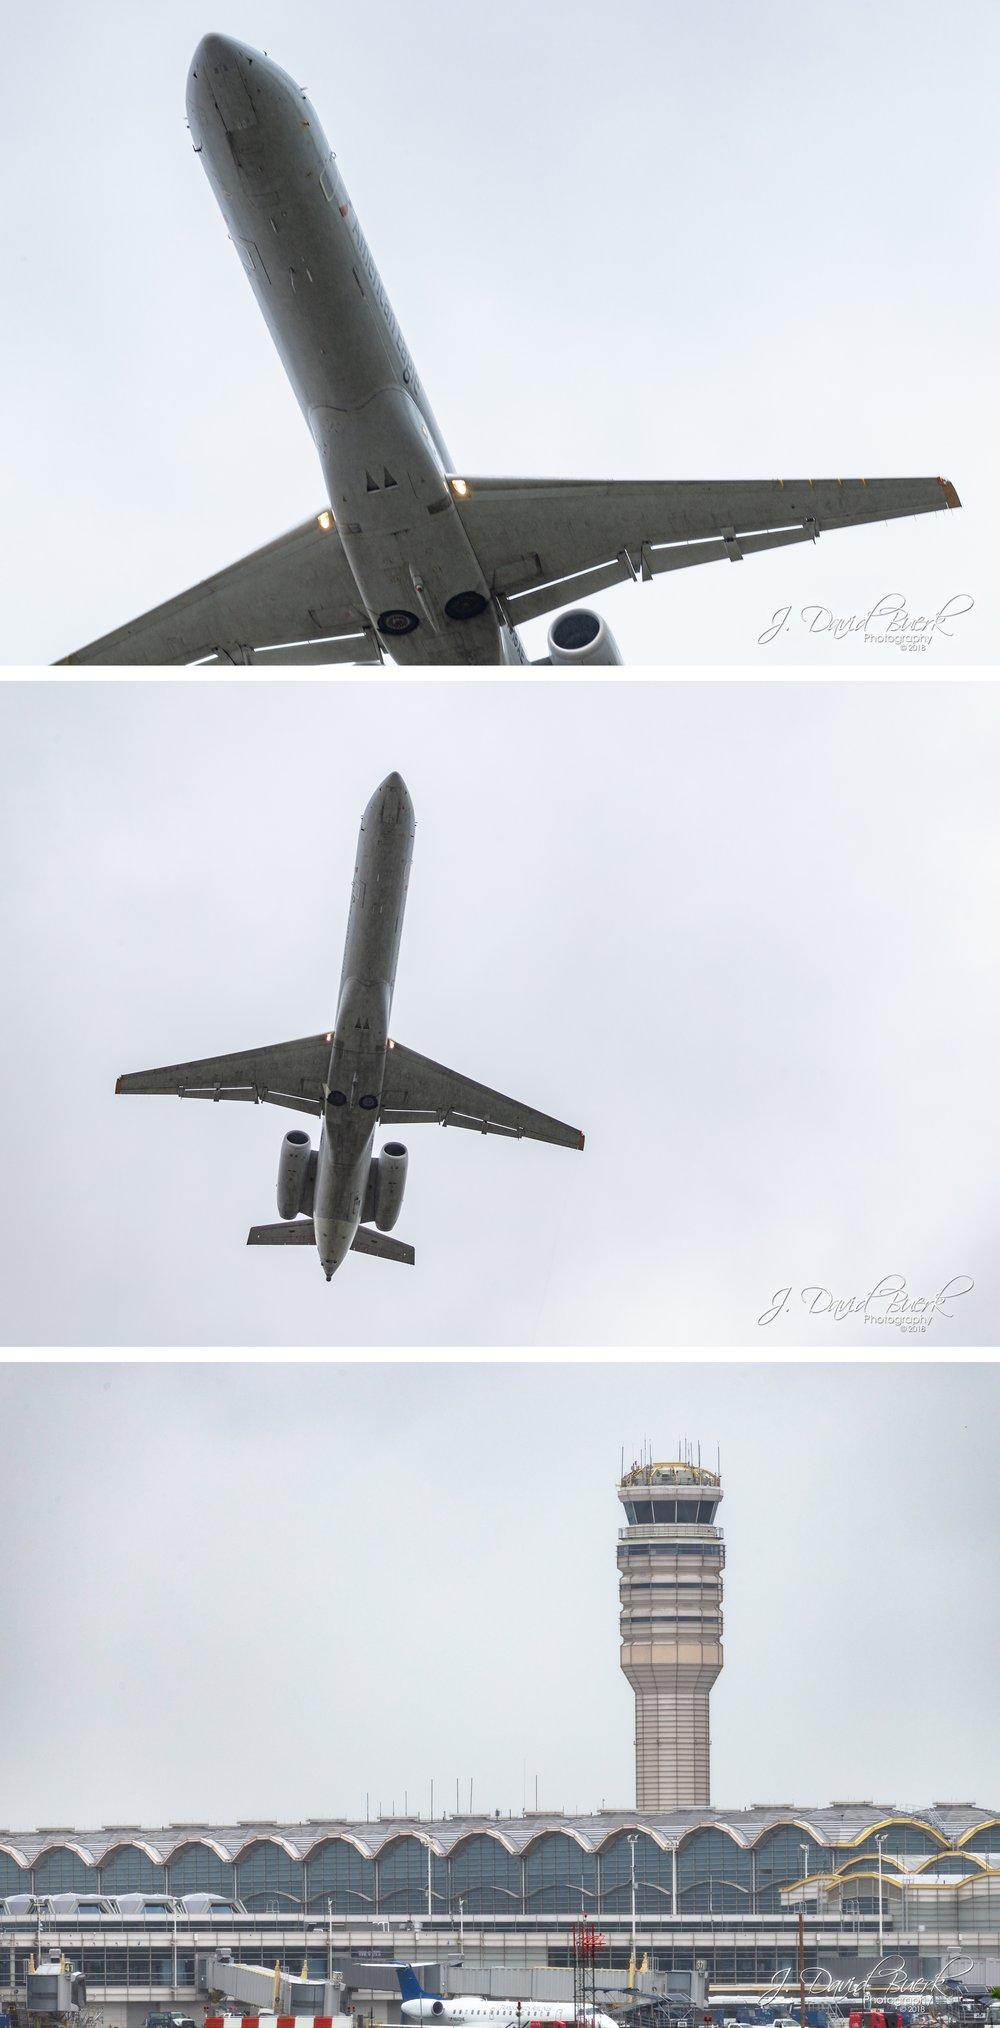 20180517 DCA Planespotting 4.jpg